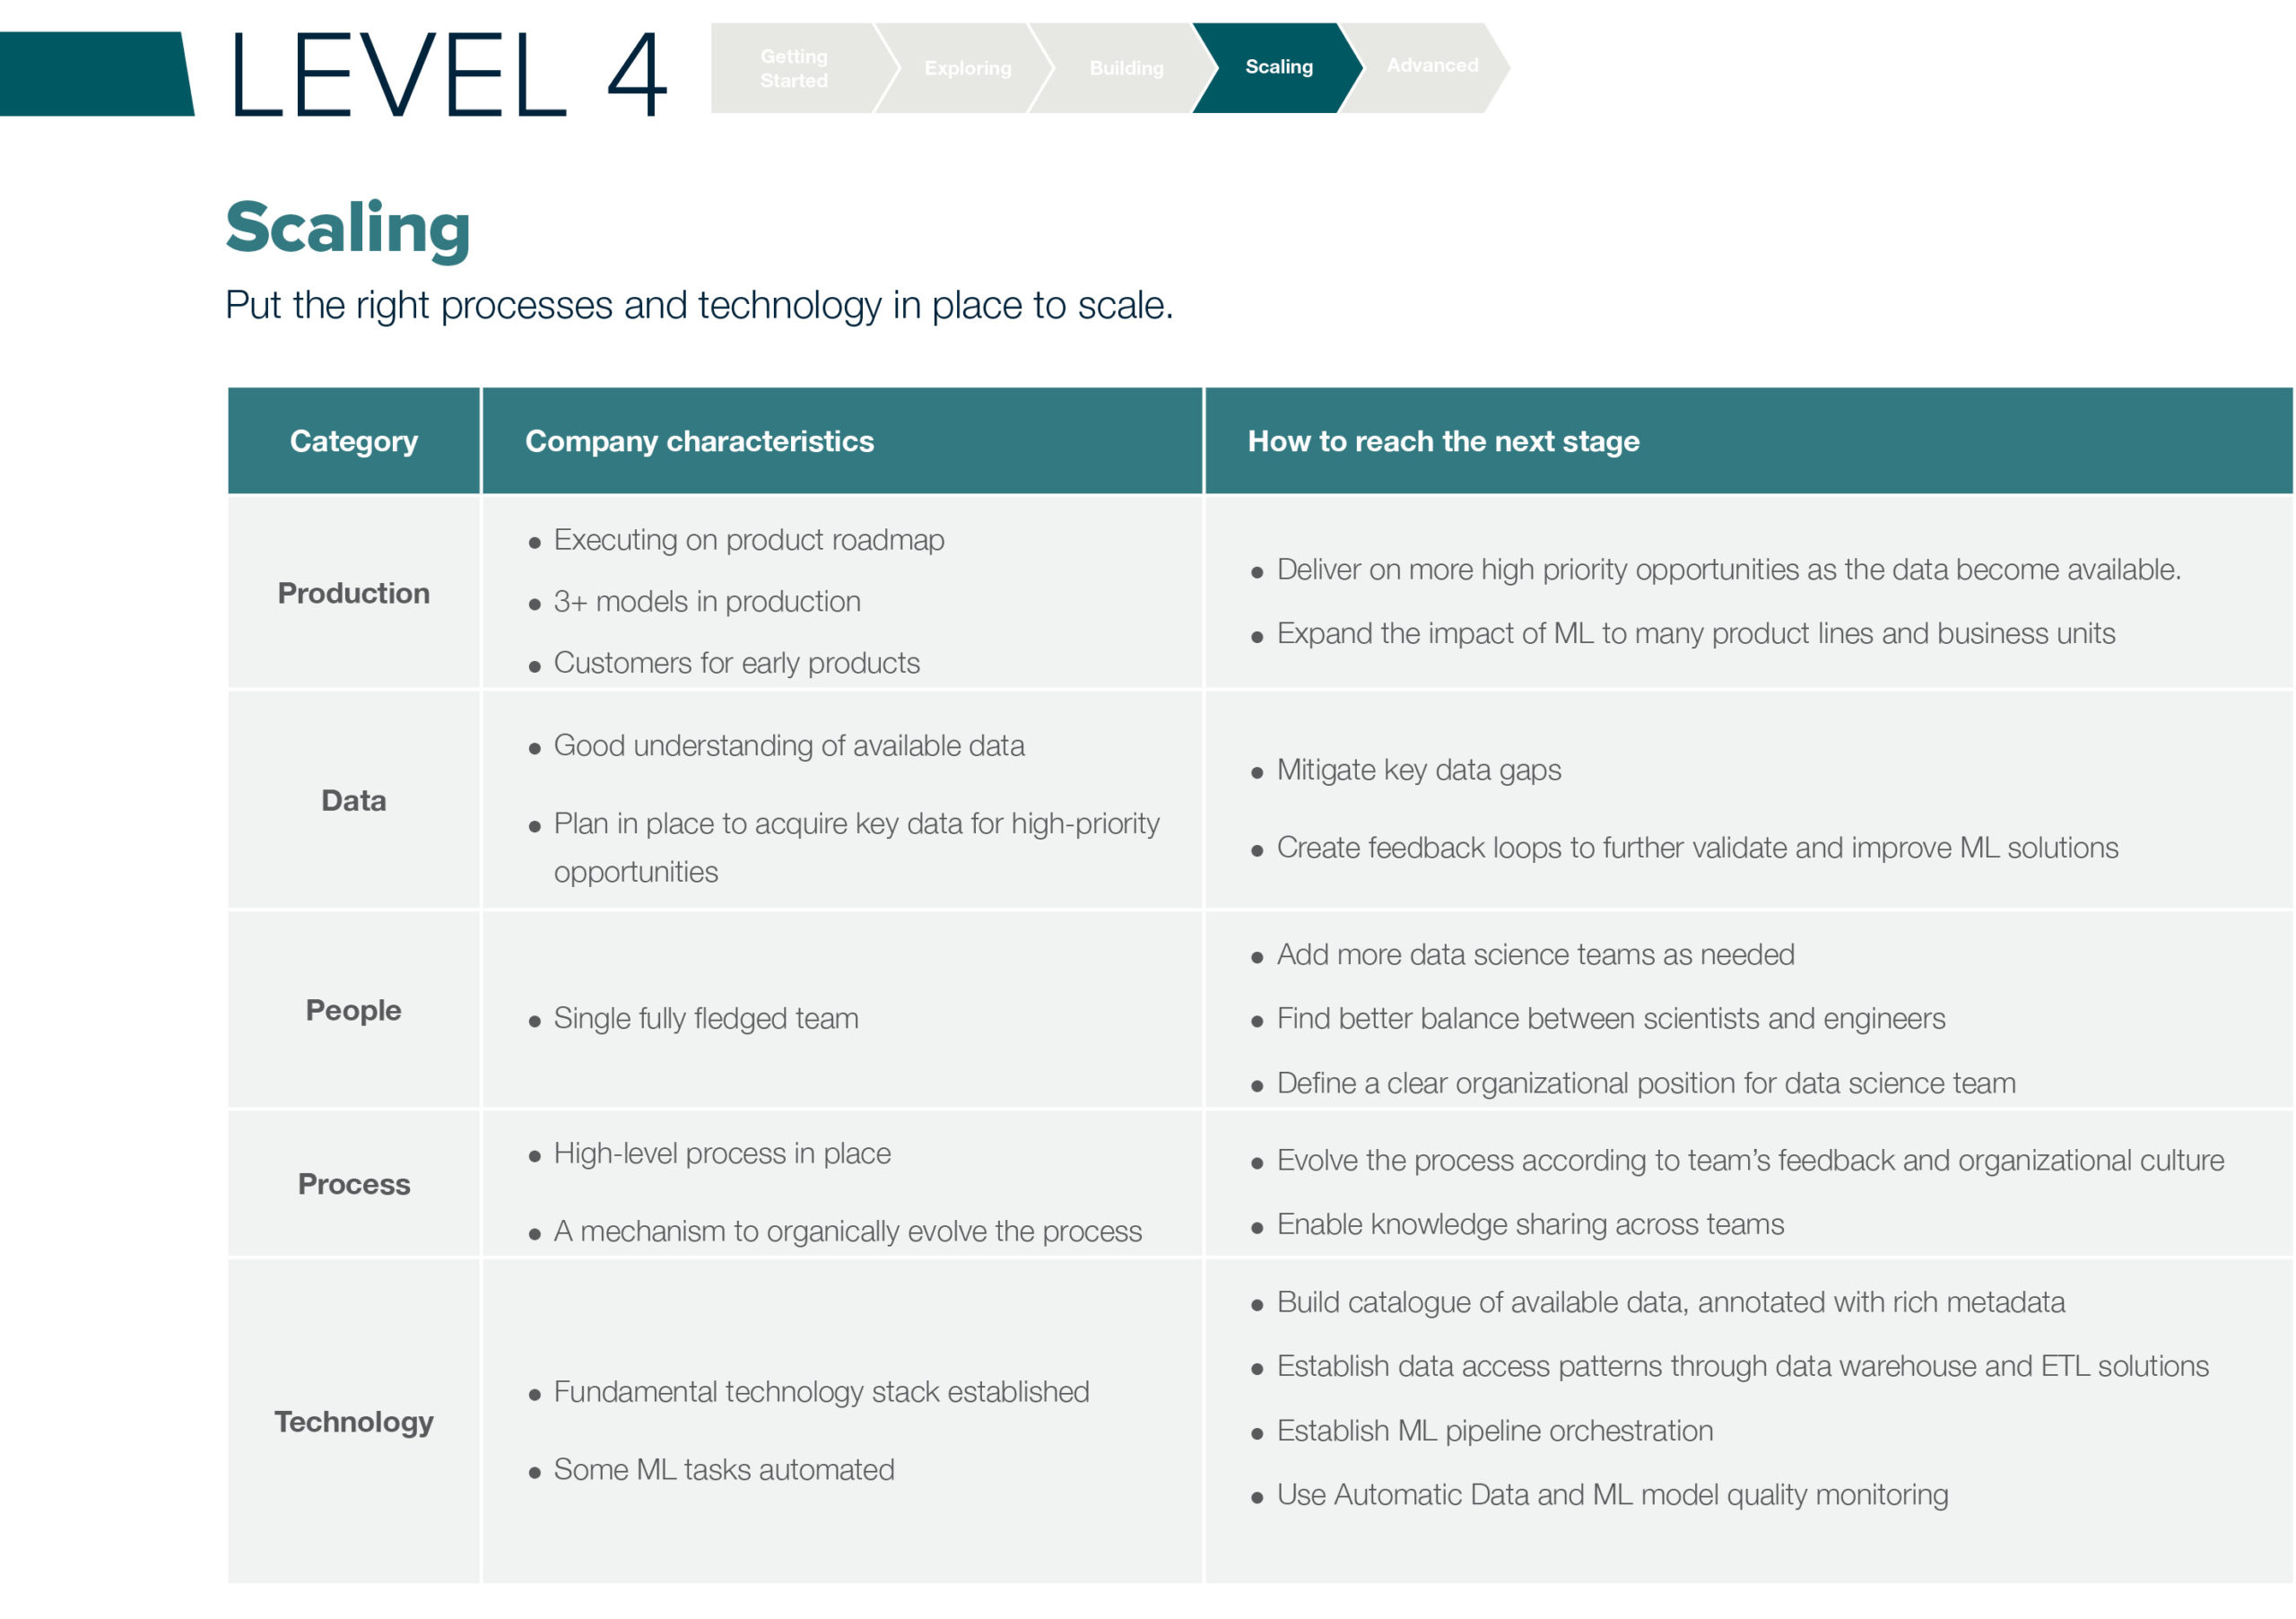 ML Maturity Level 4